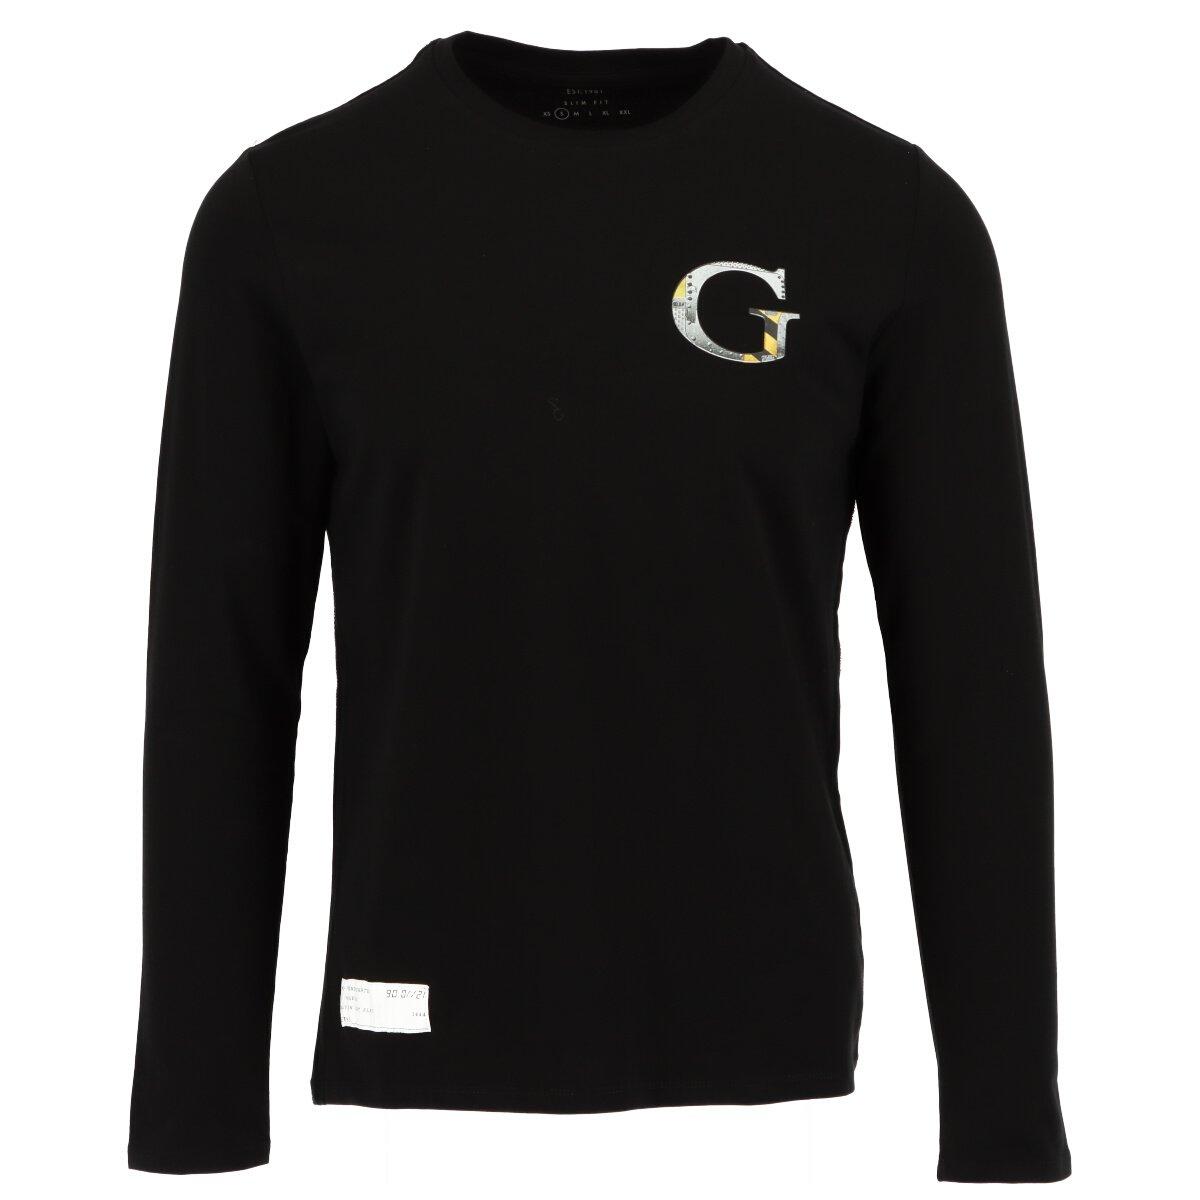 Guess Men's Sweater Various Colours 305533 - black XS